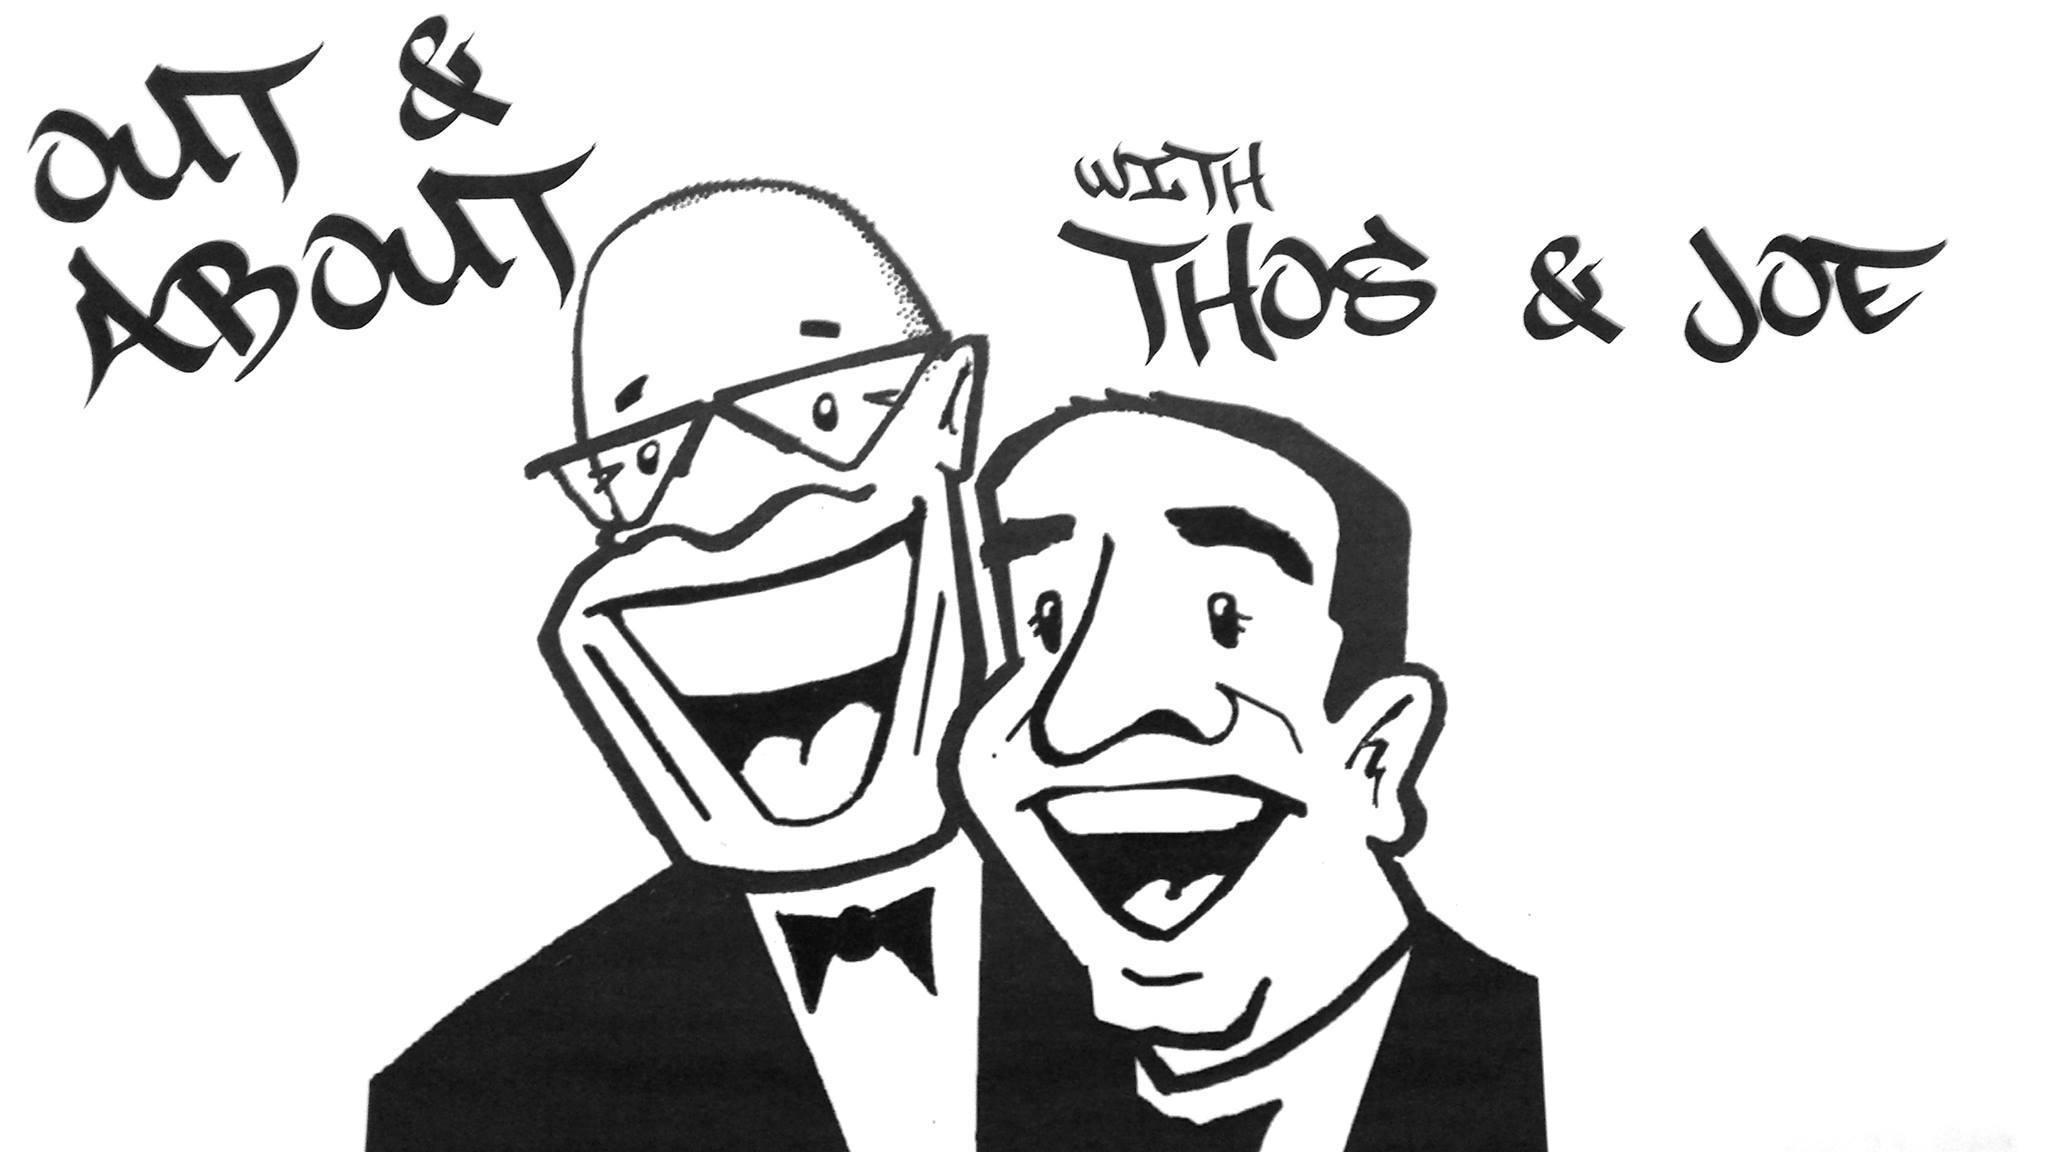 7555890cd206b9d0afb0_Joe_-_Thos_Cartoon.jpg